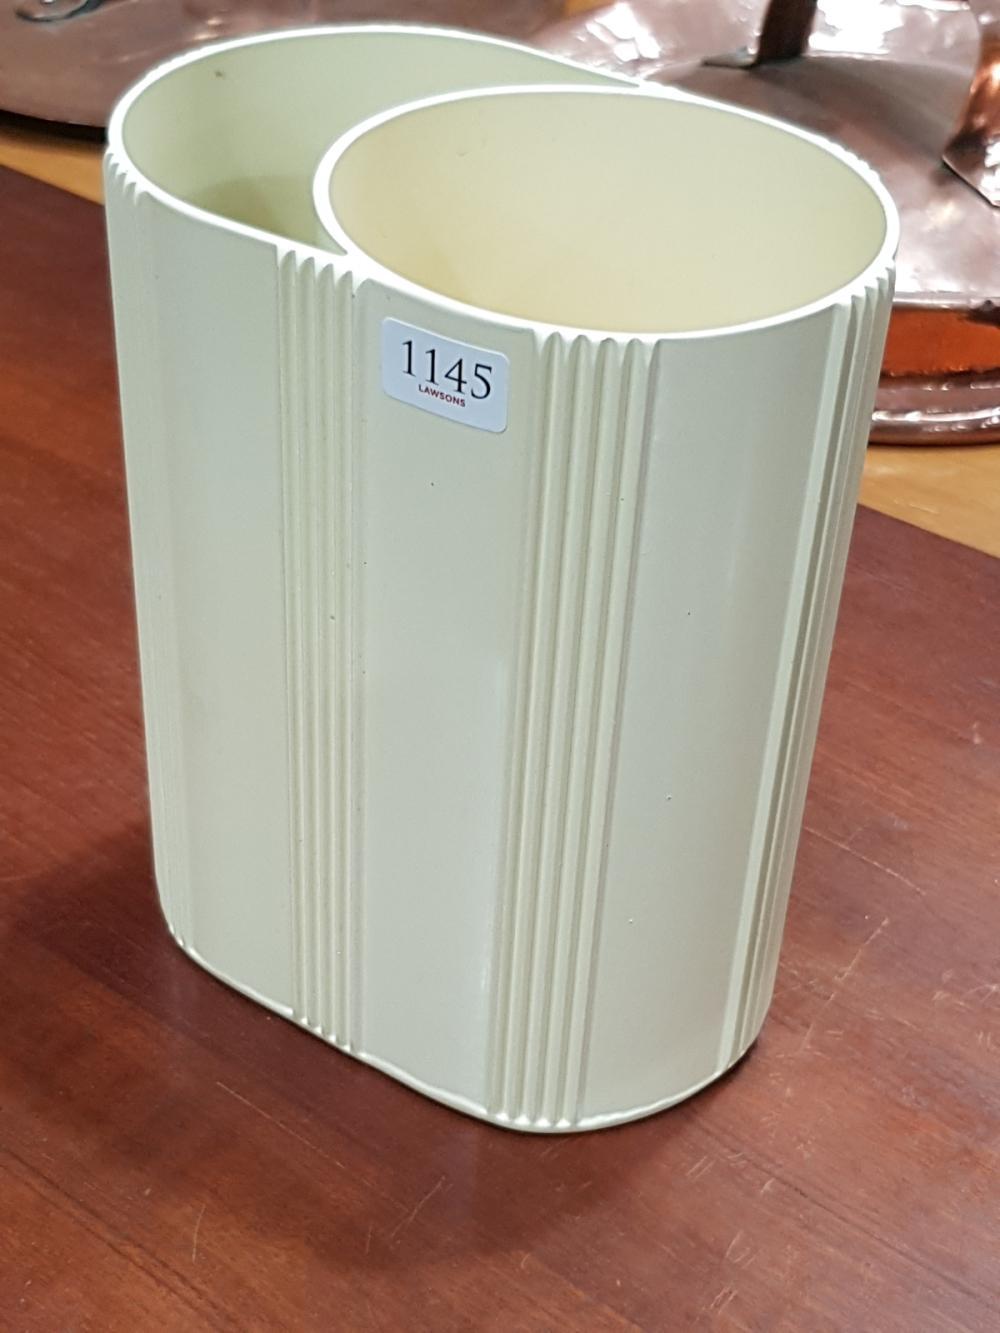 Lot 1145: Aluminium Extraction Wine Cooler, Made in Sydney